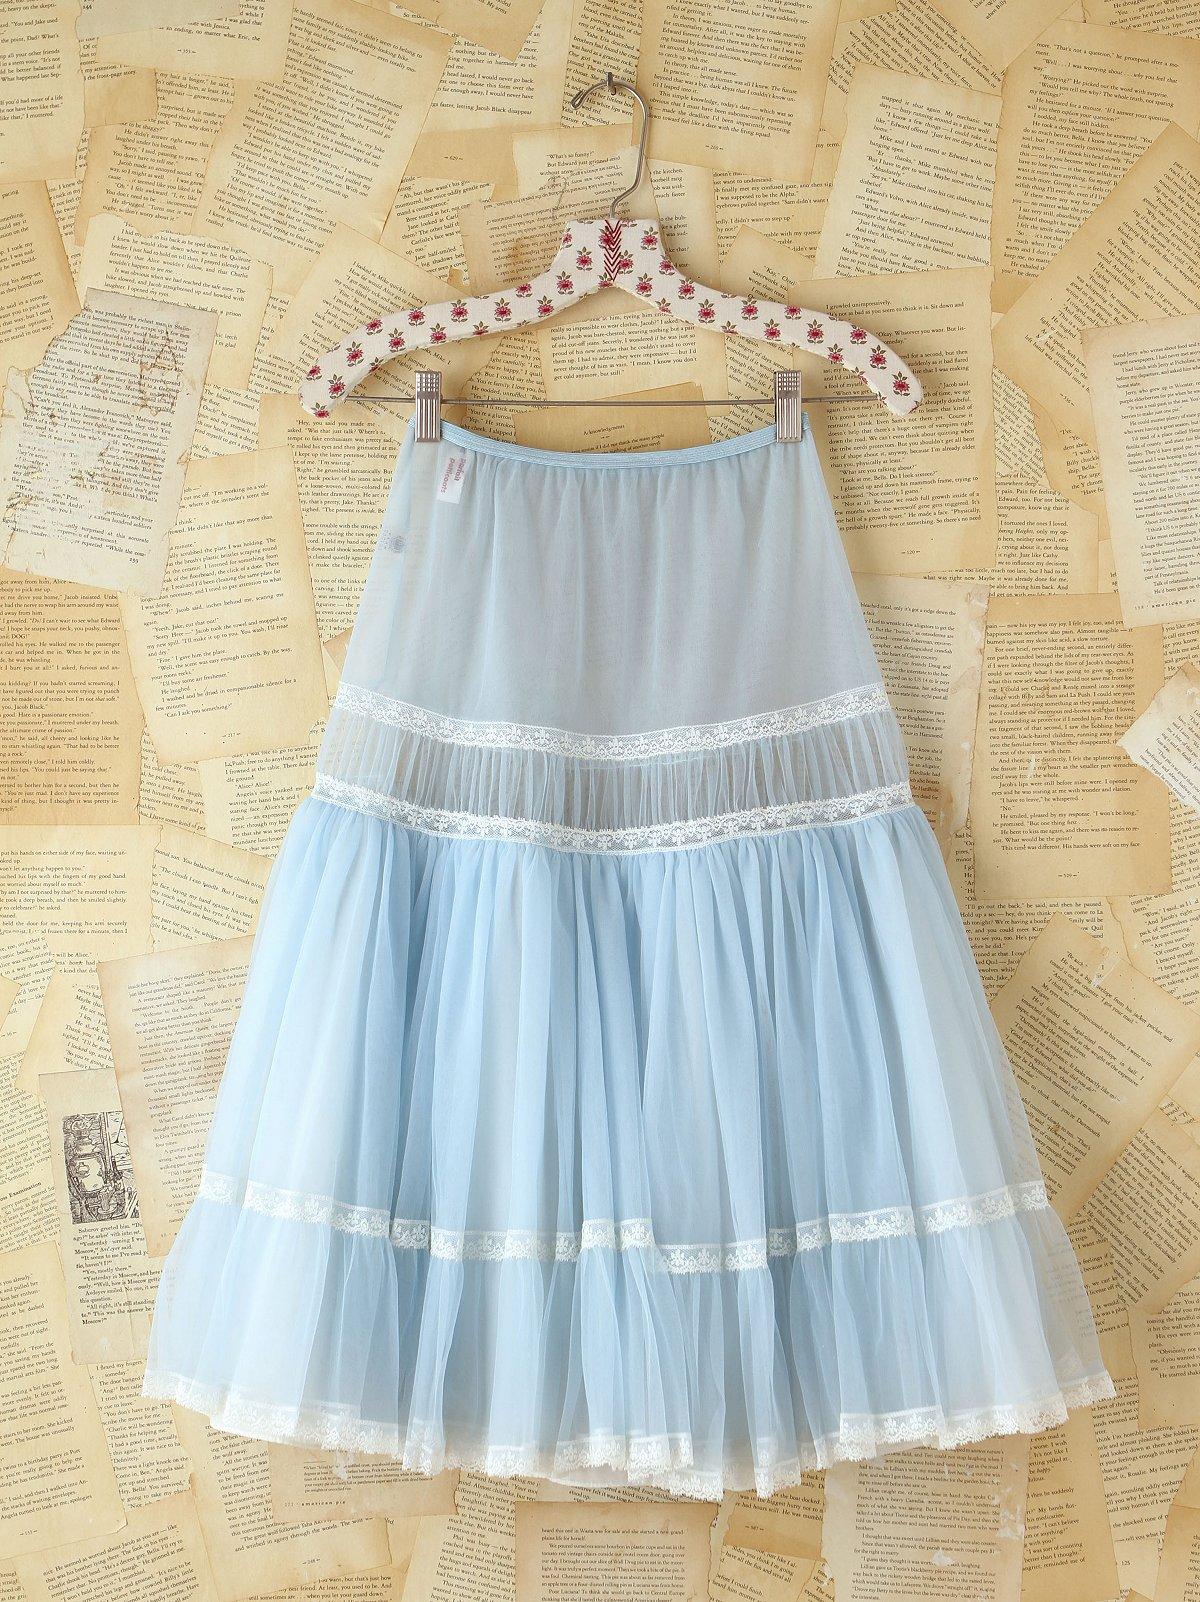 Vintage 1950s Tulle Skirt